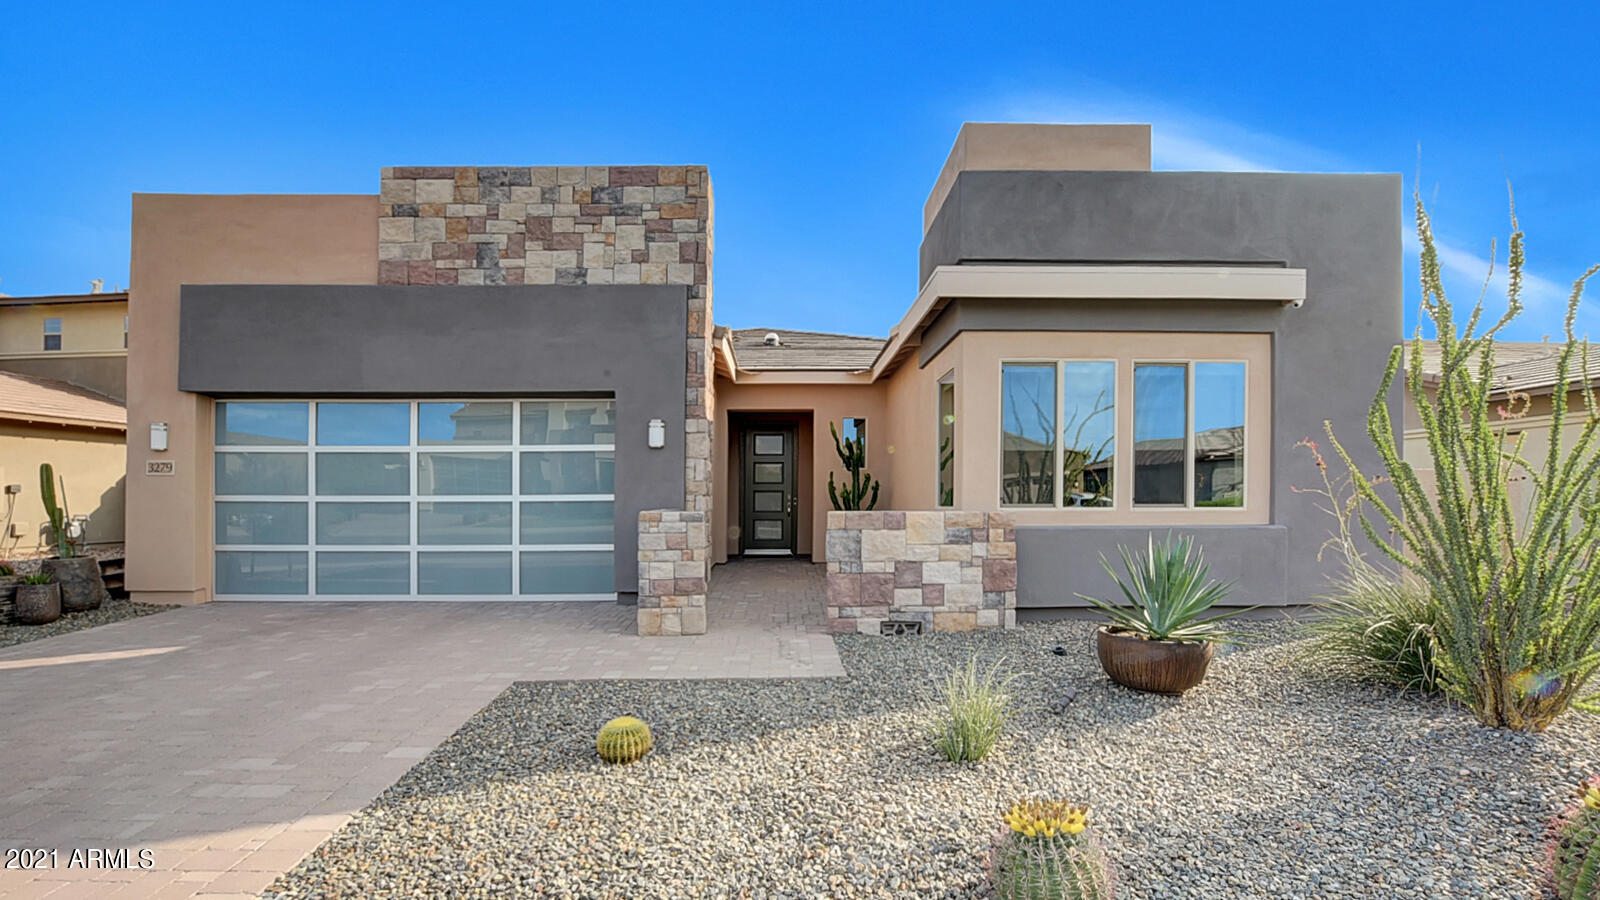 MLS 6300916 3279 E ORLEANS Drive, Gilbert, AZ 85298 4 Bedroom Homes